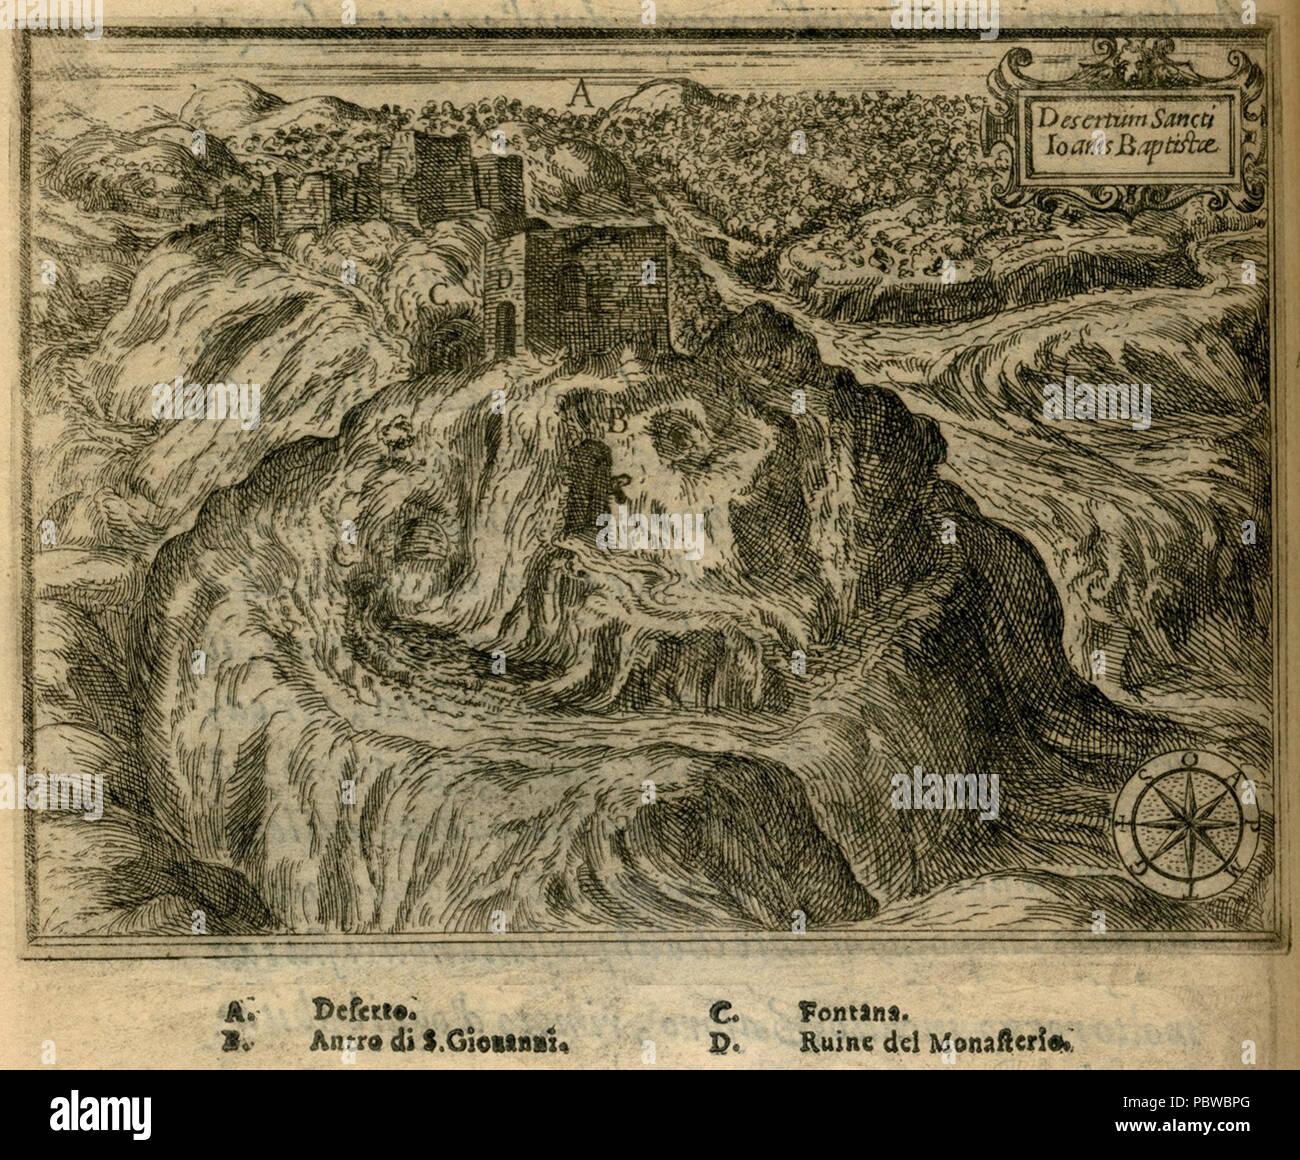 160 Desertum Sancti Ioanis Baptistae - Zuallart Jean - 1587